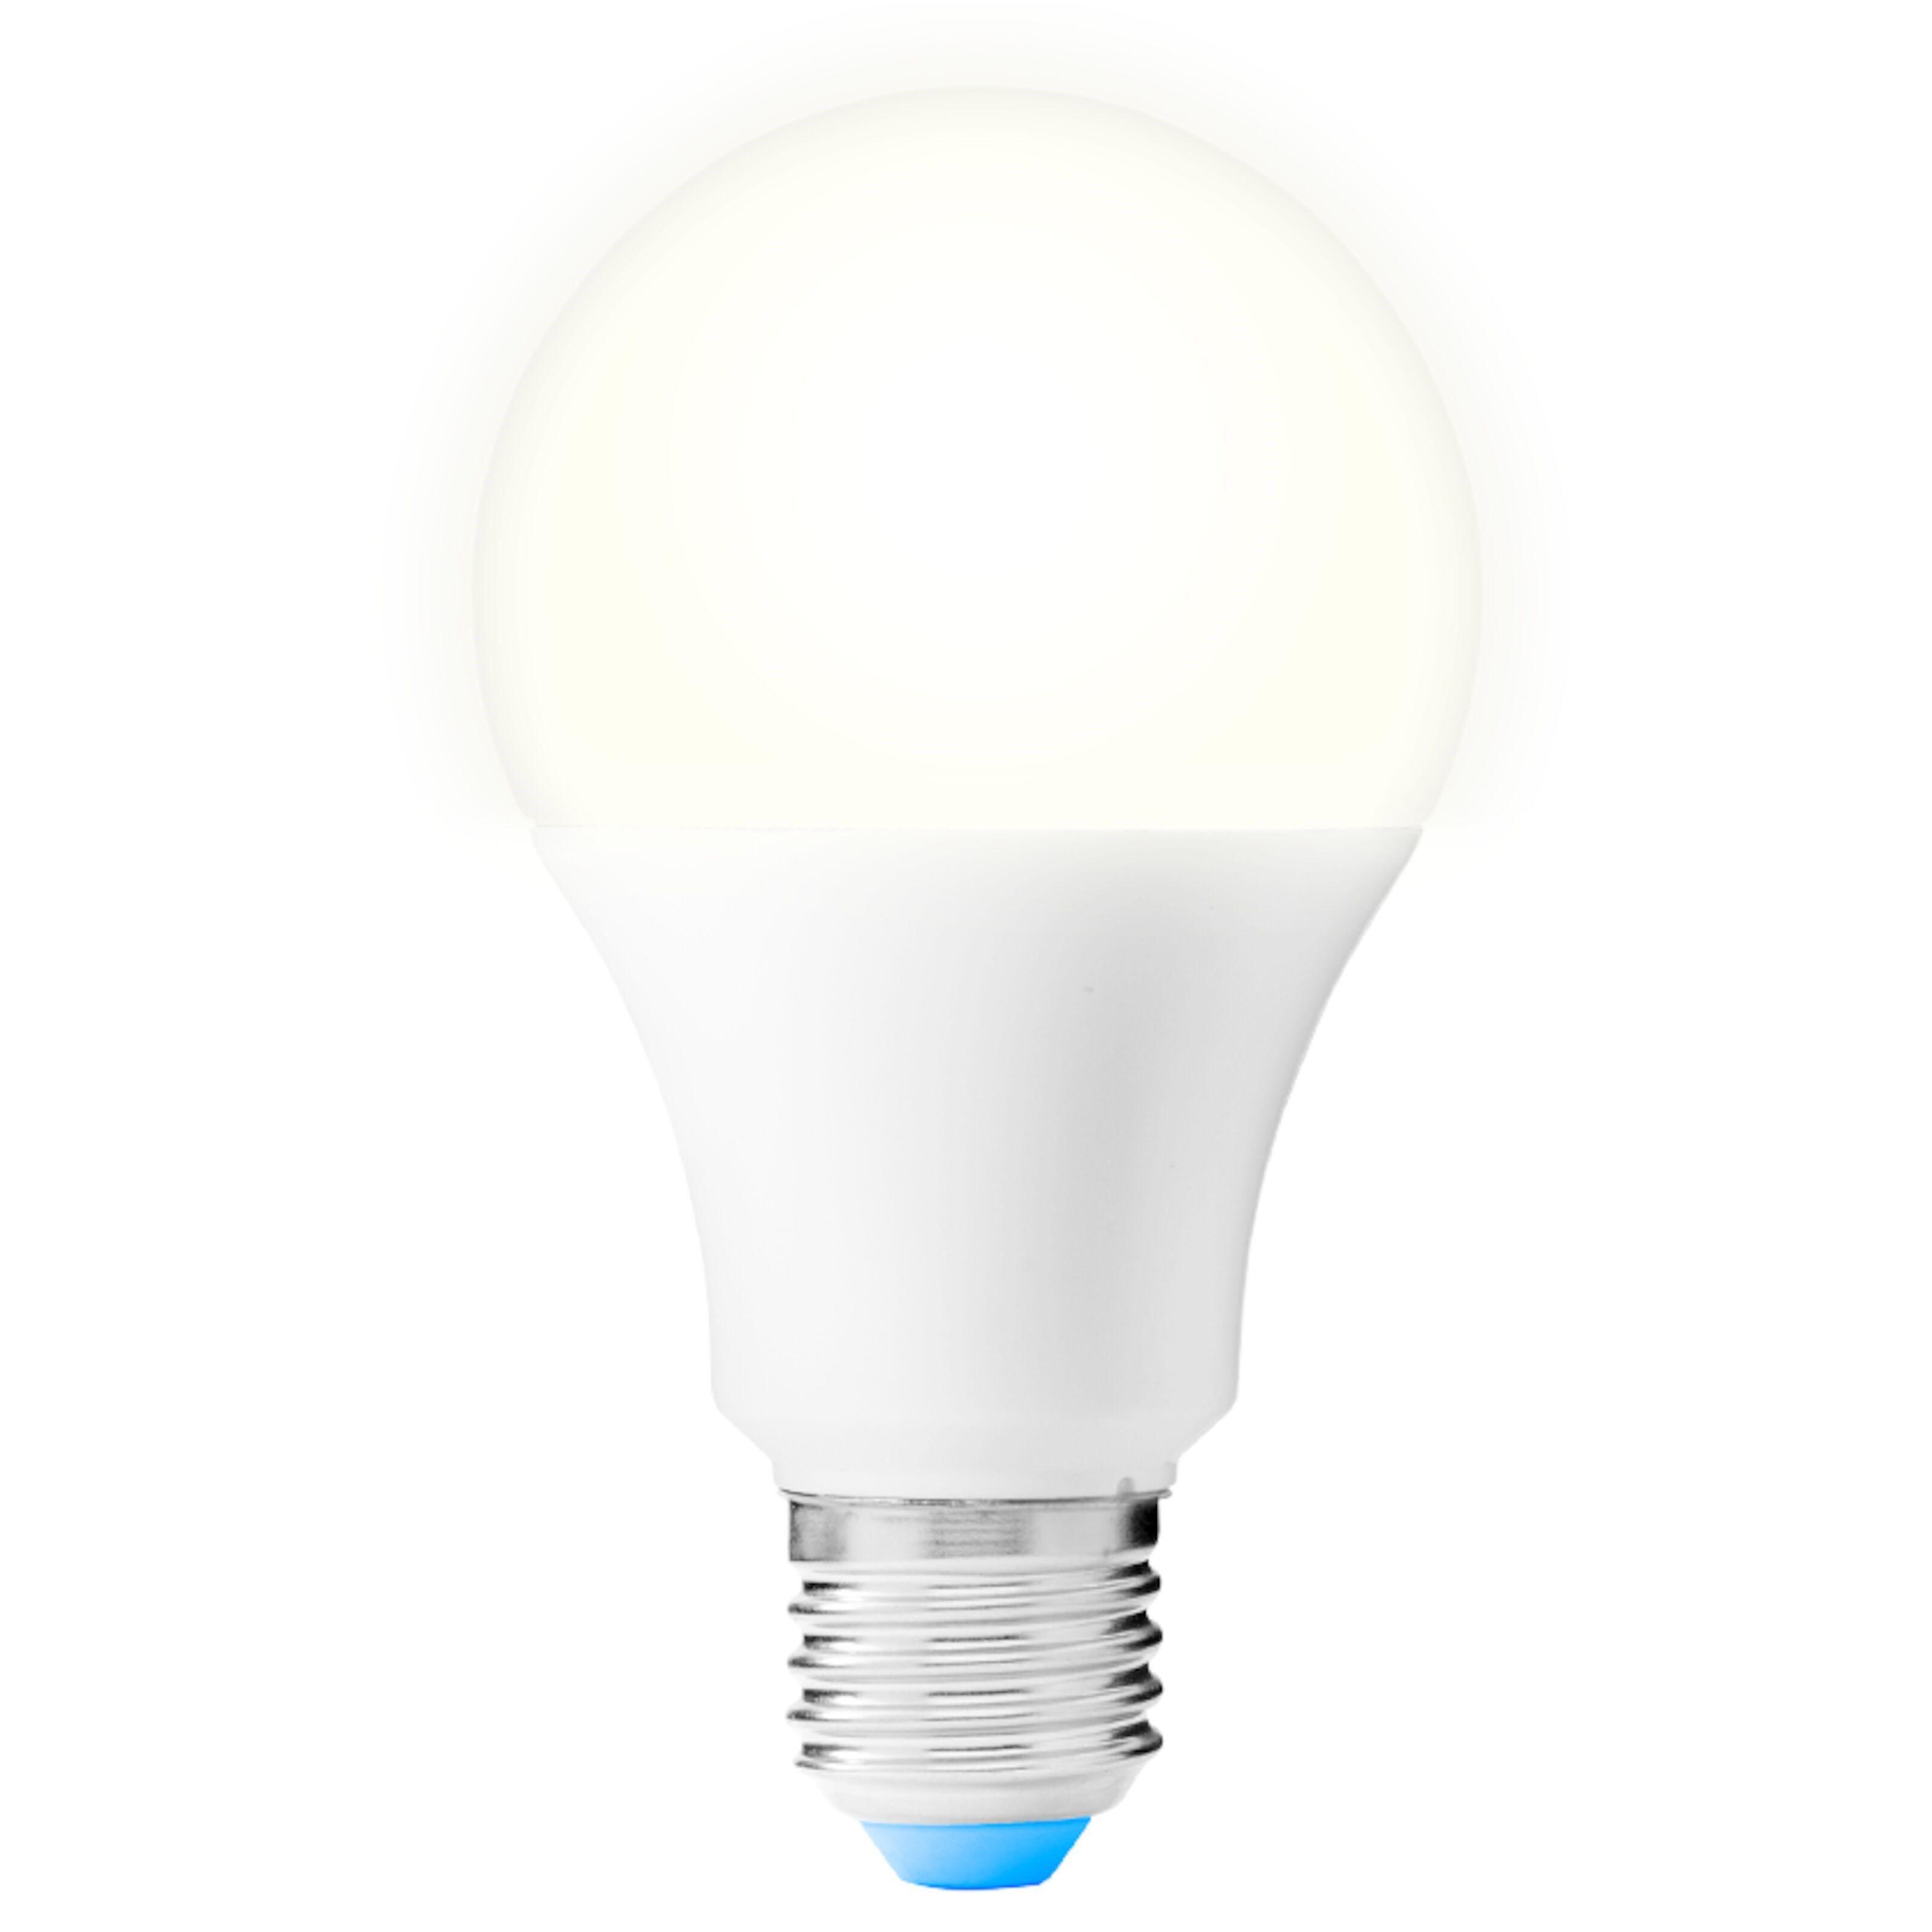 Ledsavers Led Lampa Med Skymningsrelä E27 600 Lm Led Lampor Led Lamp Lampor Led